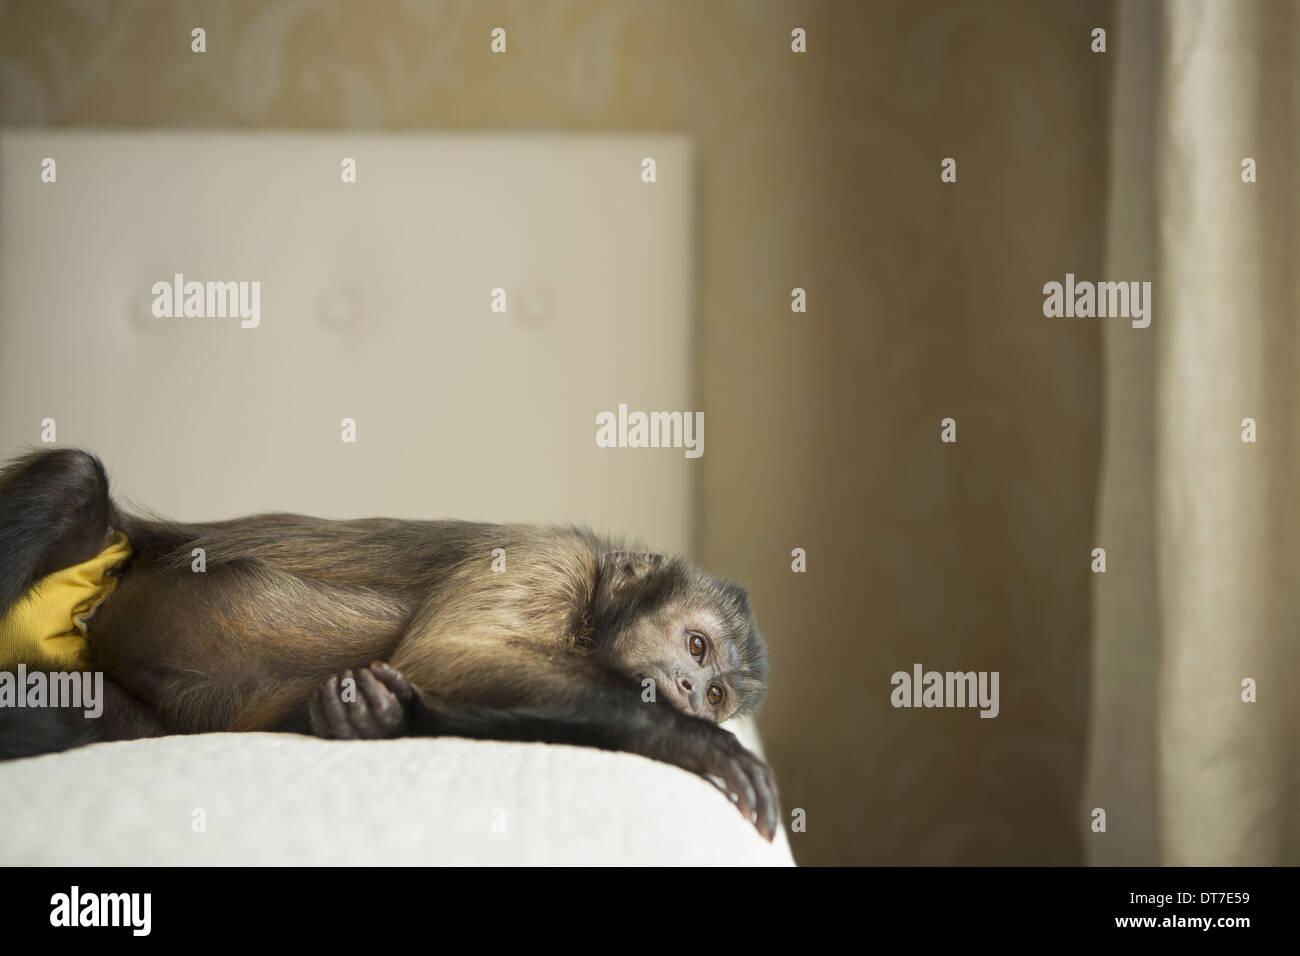 Mono Capuchino tumbado de lado sobre un lecho de Austin, Texas, EE.UU. Imagen De Stock